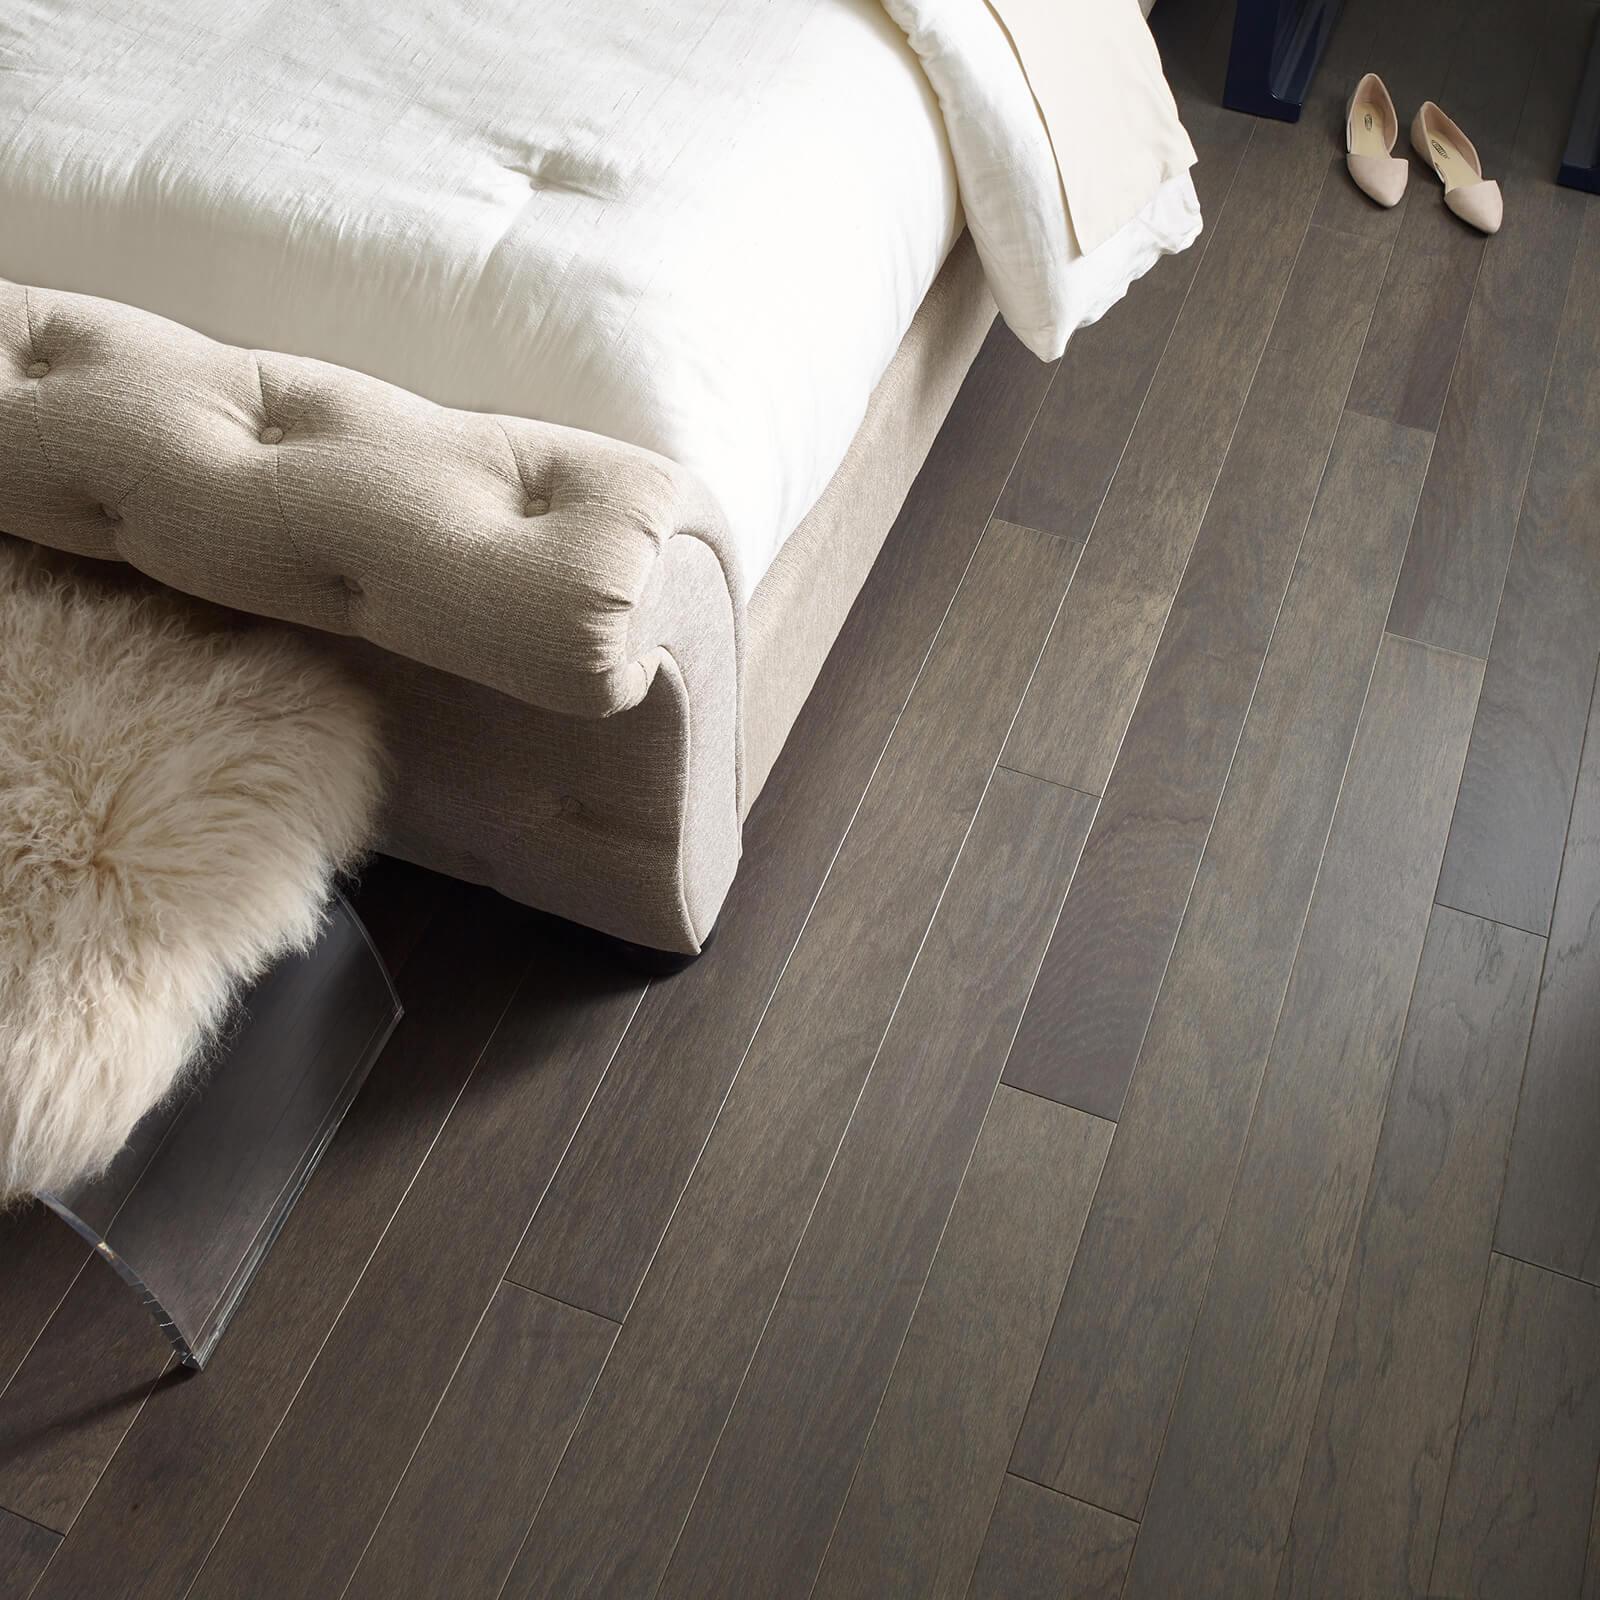 Northington Smooth-2W747-05054-Greystone-Urban Glamour-Wood-Detail-V_1600x1600